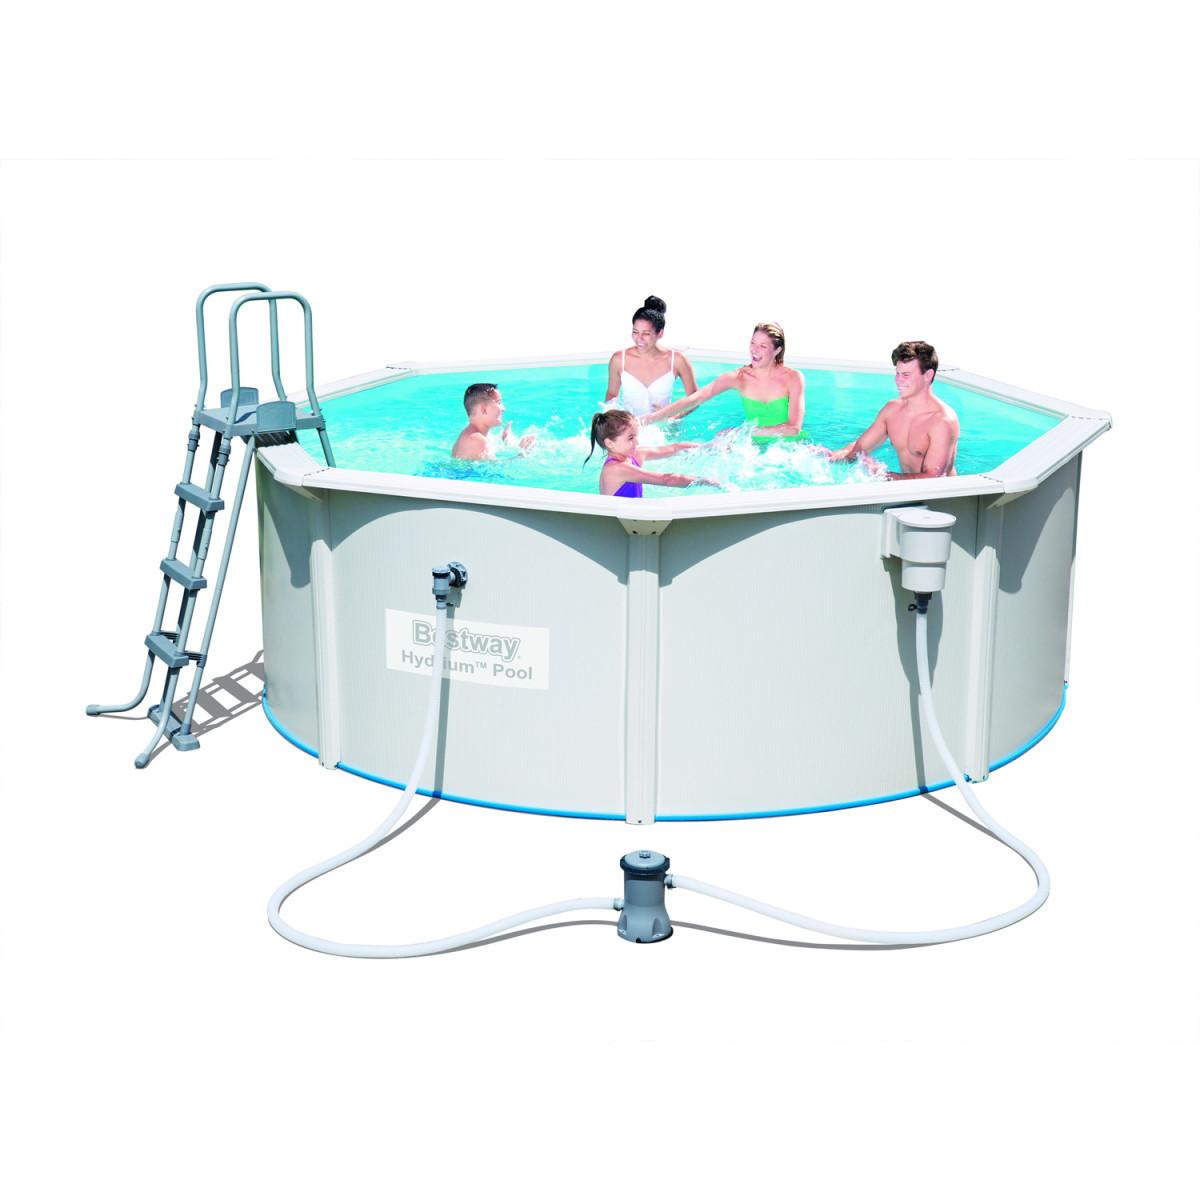 Бассейн Bestway Hydrium Pool  (360x120)  (56571)